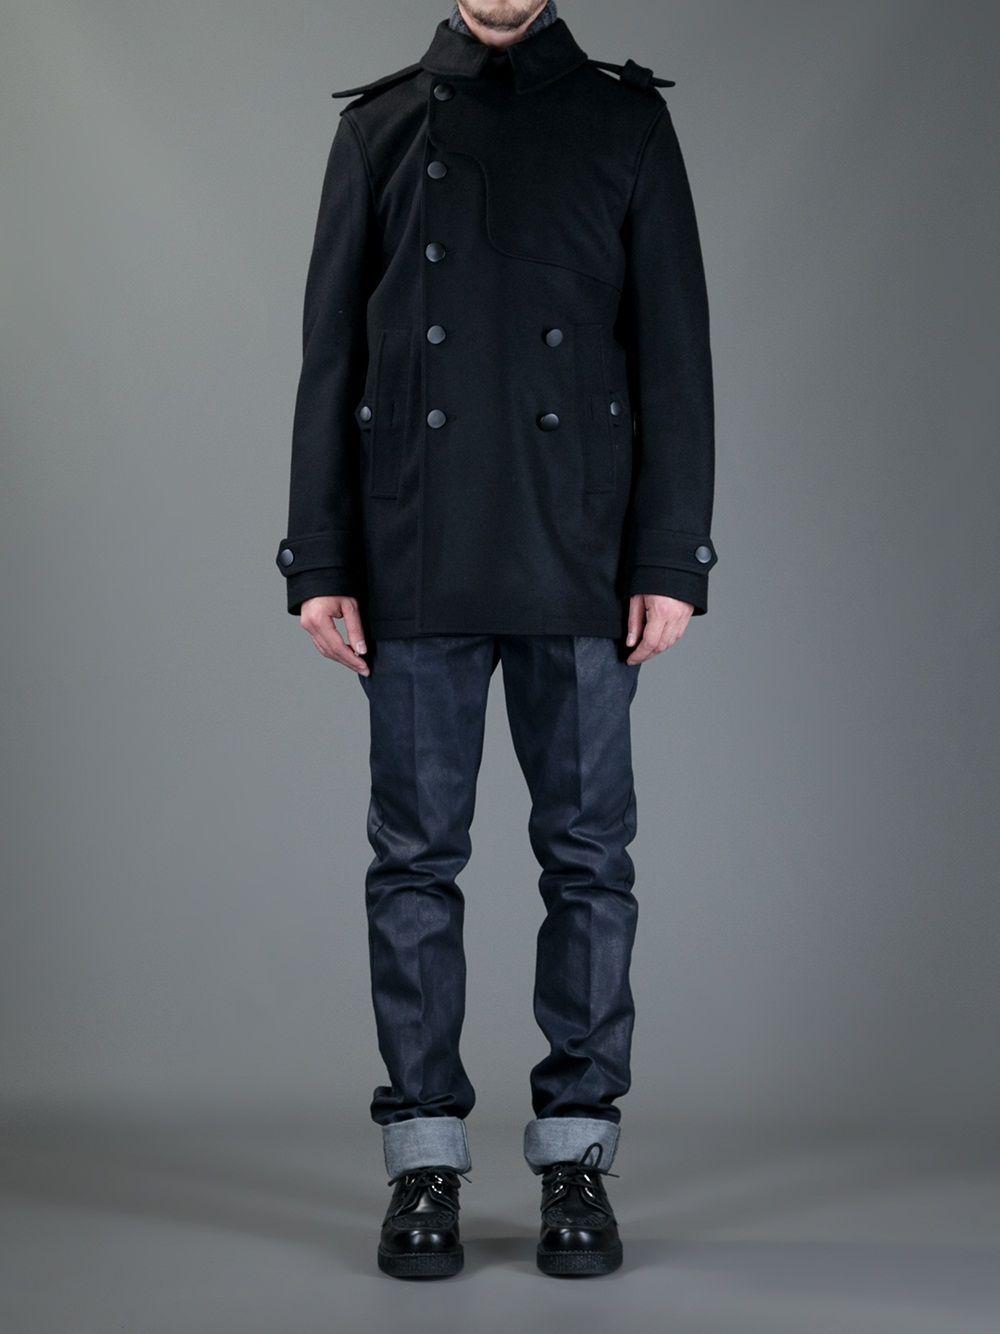 d25383c607b yves-saint-laurent-double-breasted-coat-black | Mens' Fashion ...